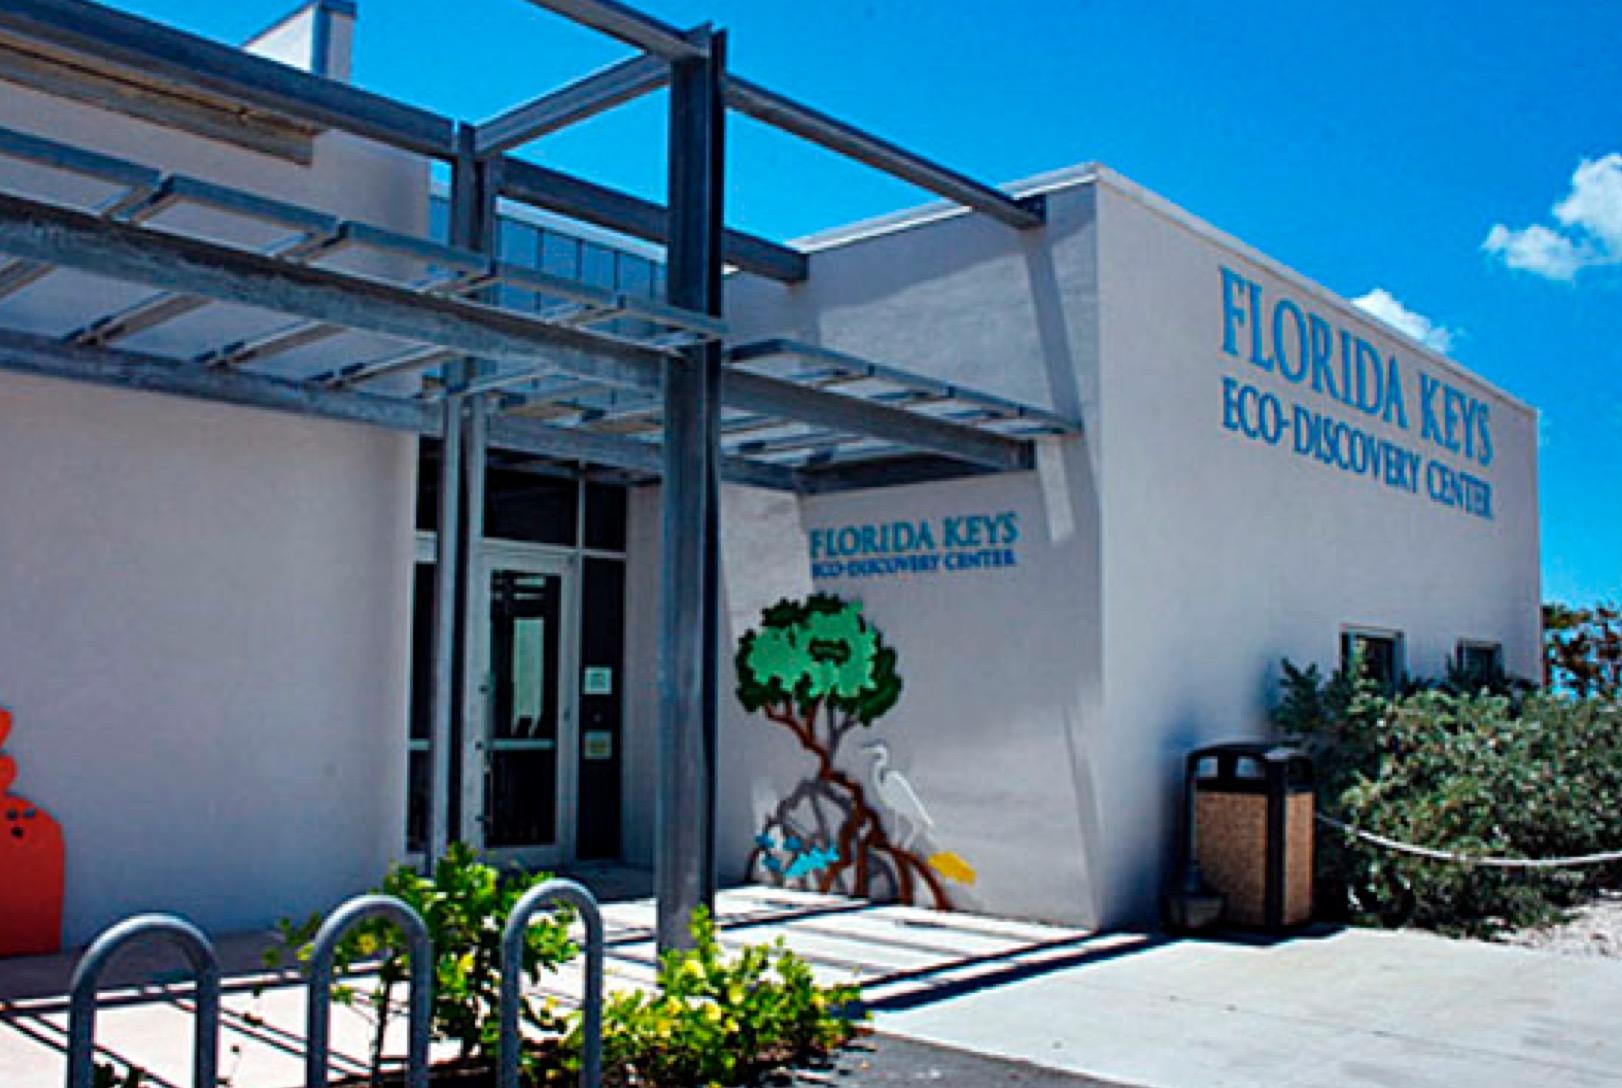 LE FLORIDA KEYS  ECO-DISCOVERY CENTER